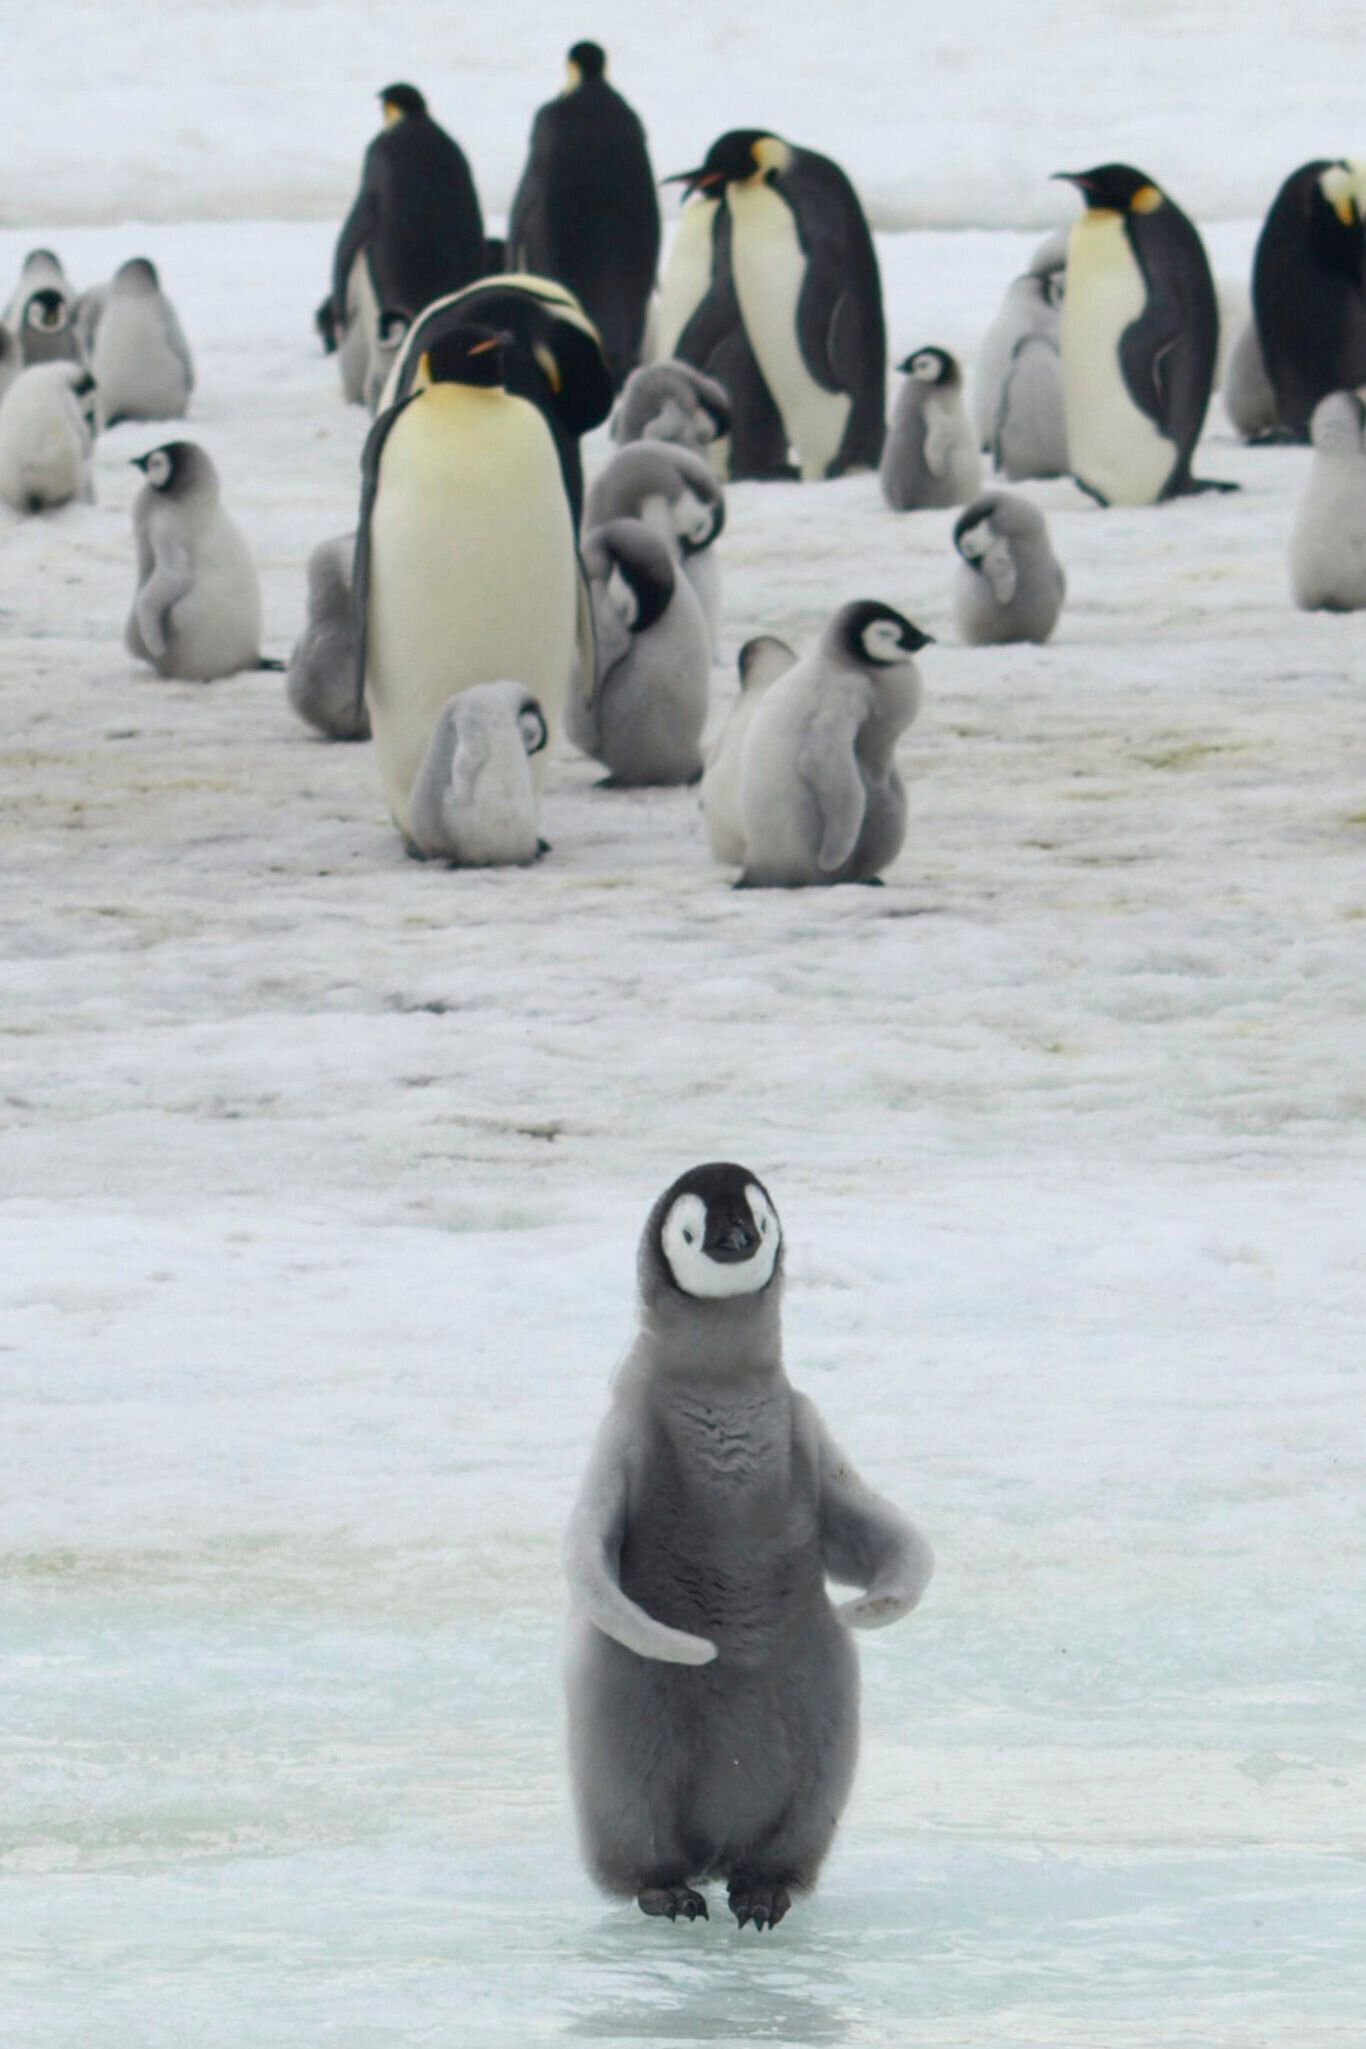 Emperor penguin chicks at Antarctica's Halley Bay. (Peter Fretwell/British Antarctic Survey via AP)